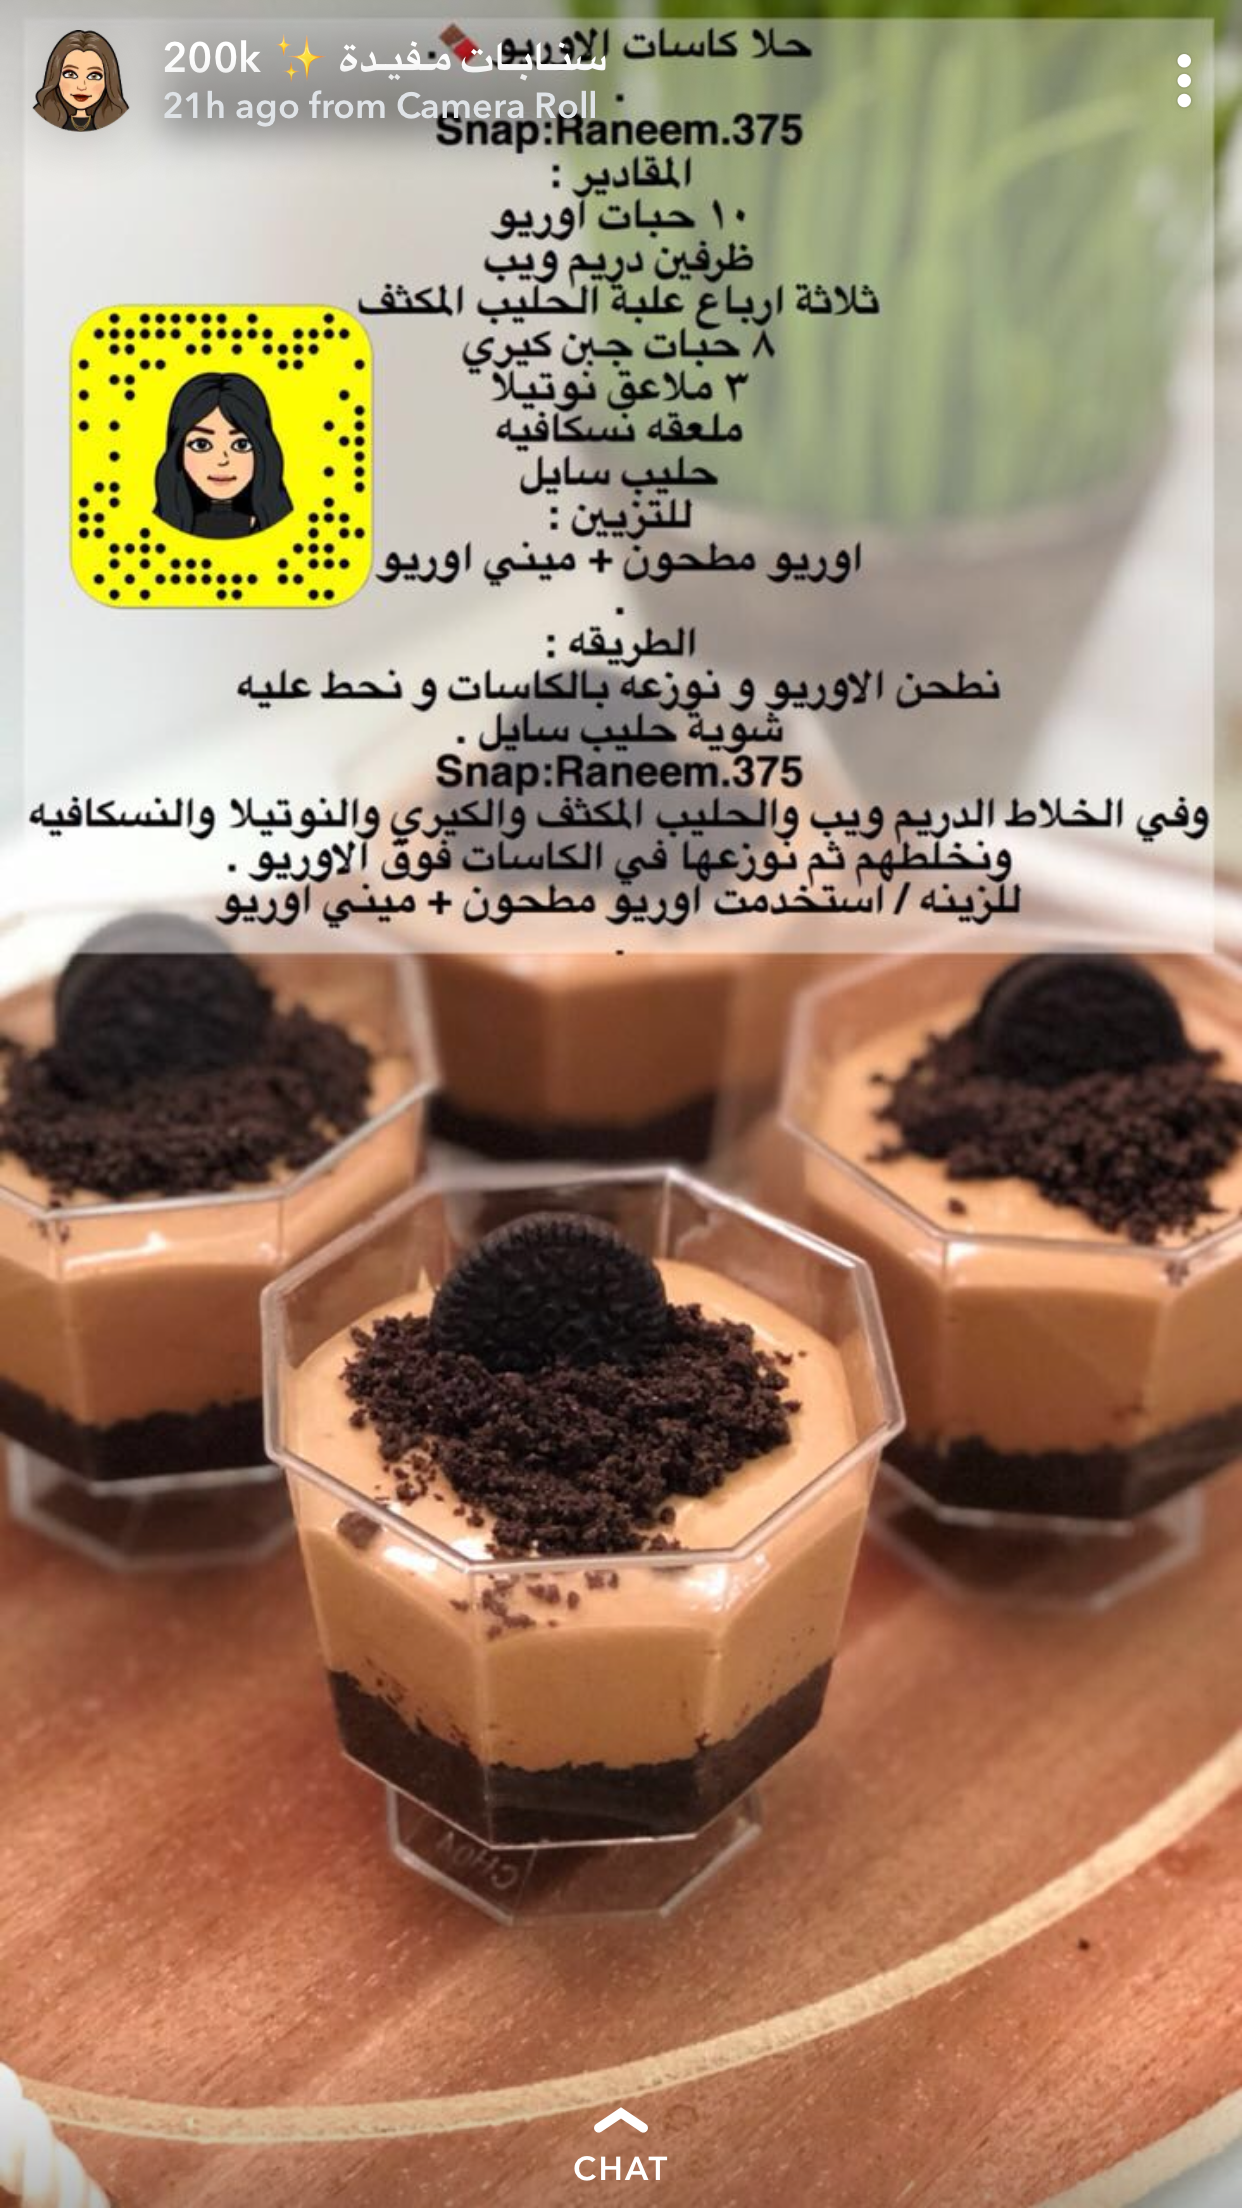 حلا كاسات Food Drinks Dessert Food Videos Desserts Yummy Food Dessert